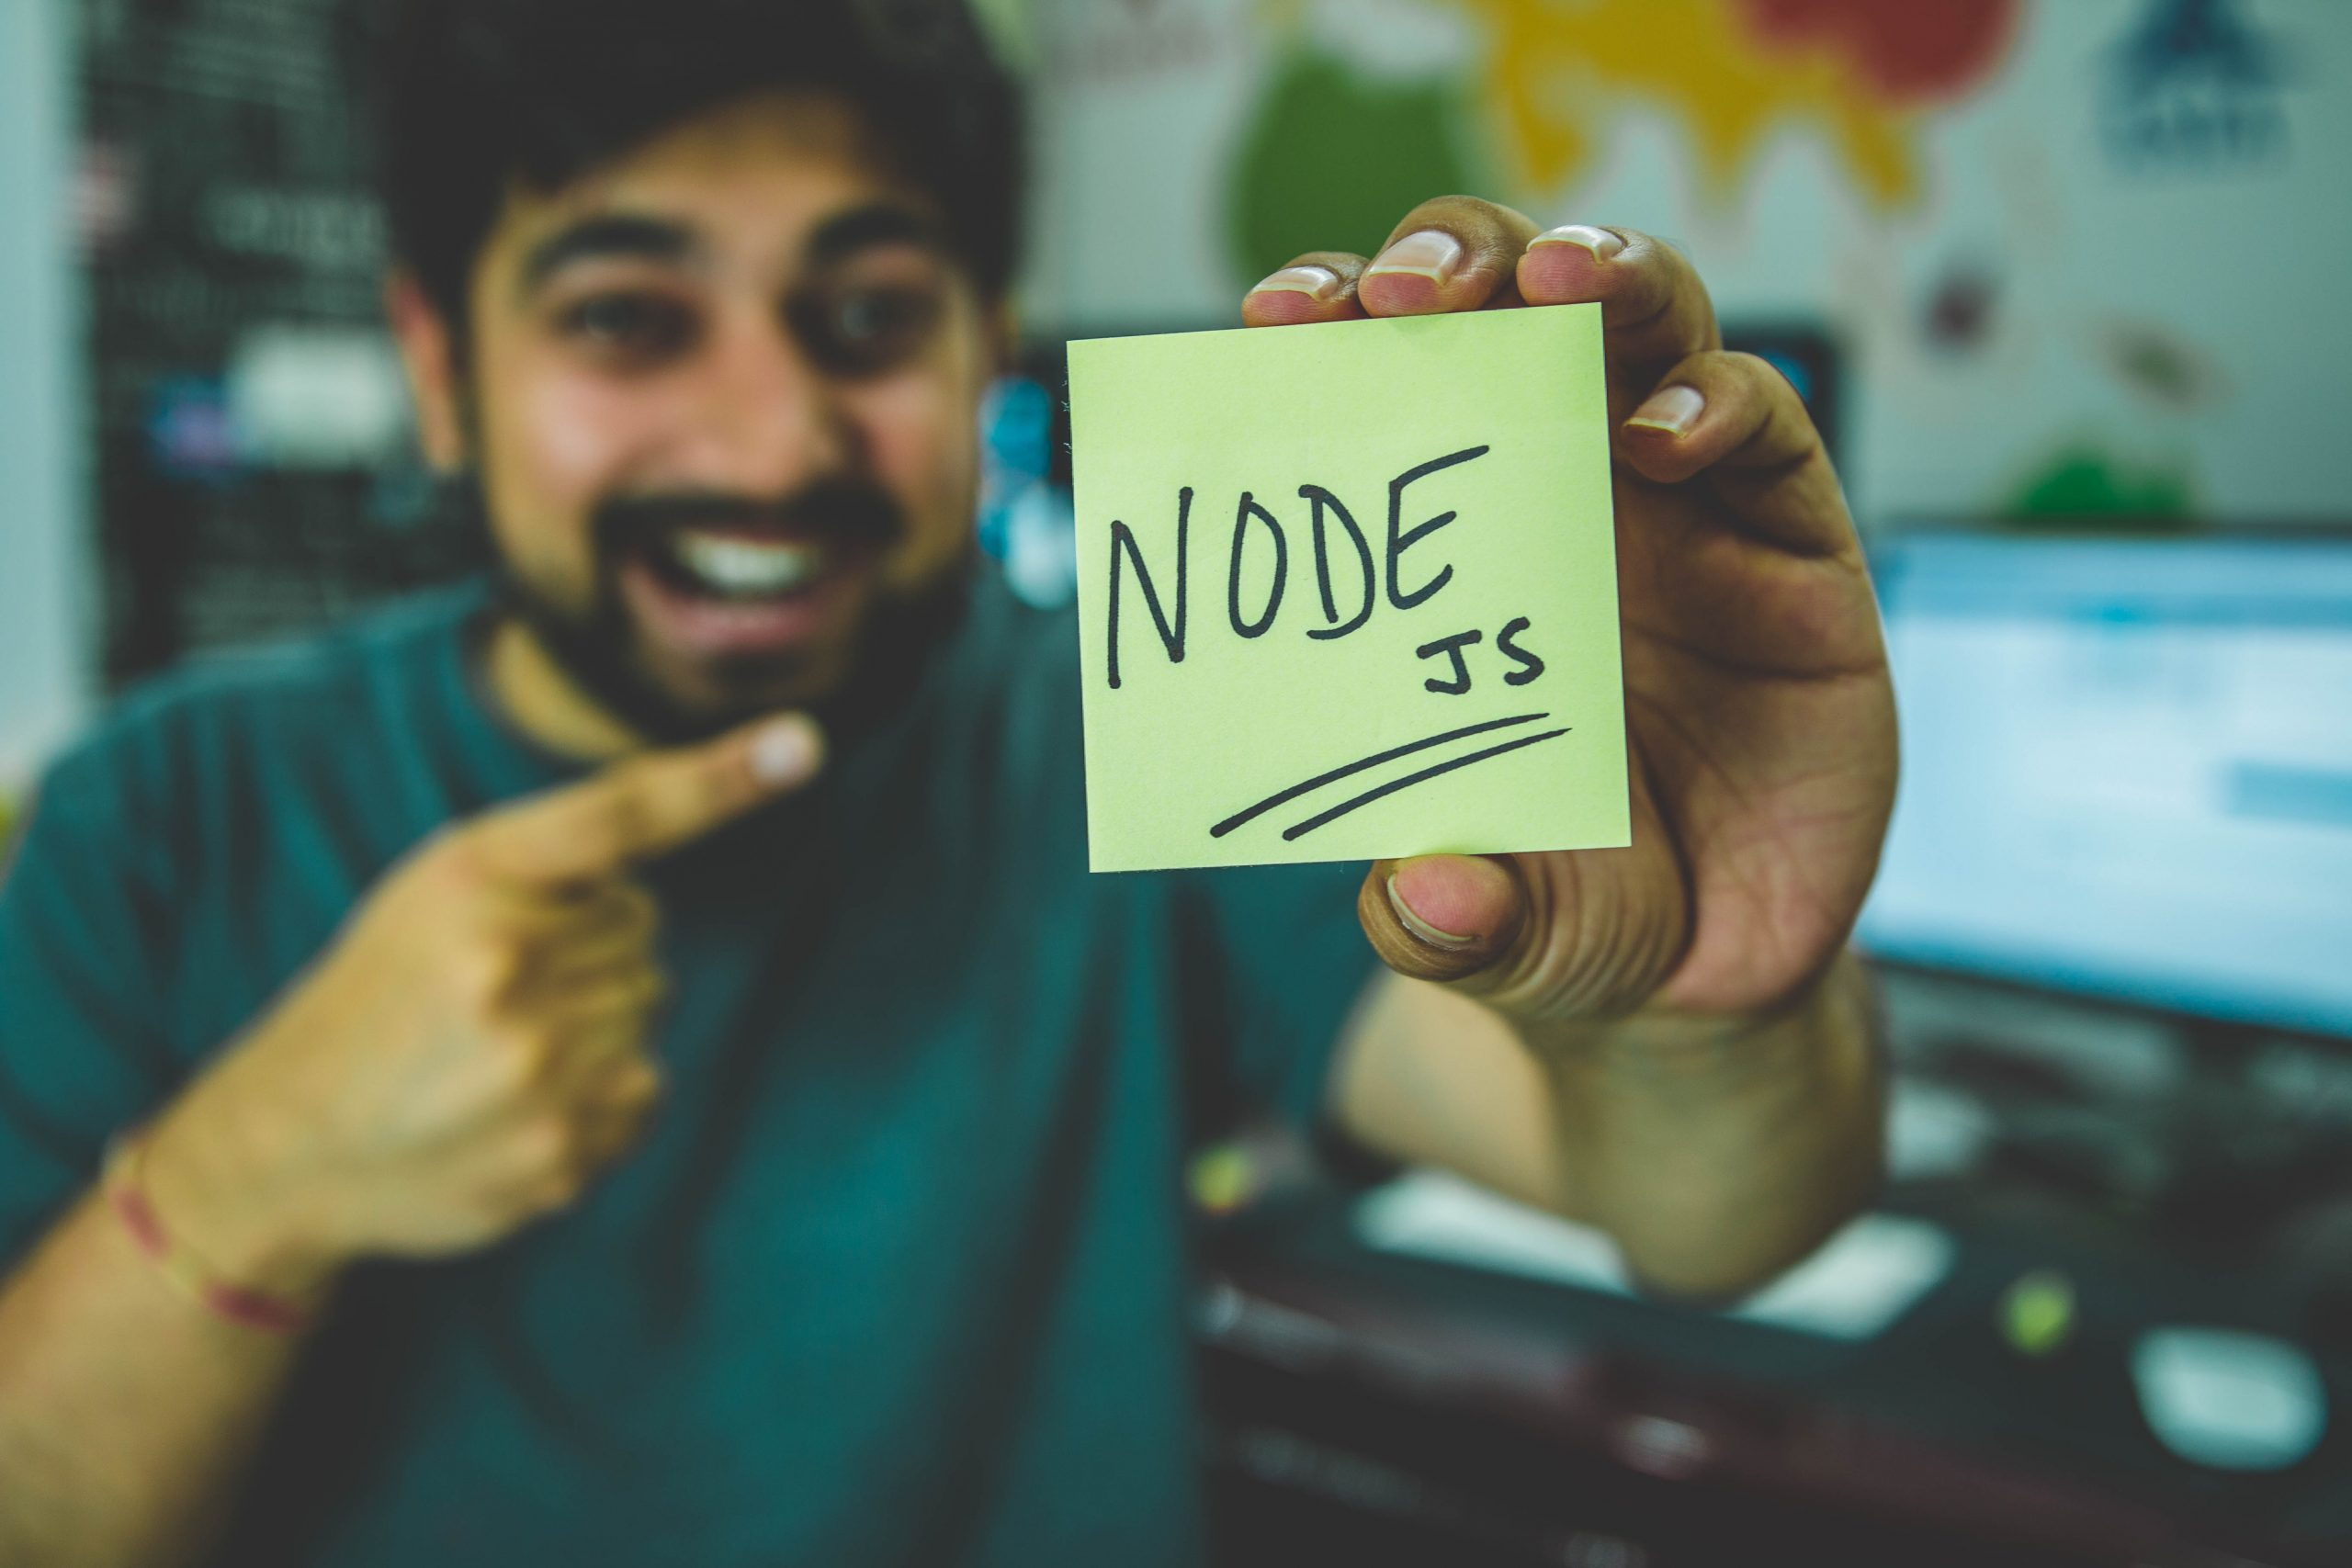 Kağıtta Node jS yazısı gösteren erkek